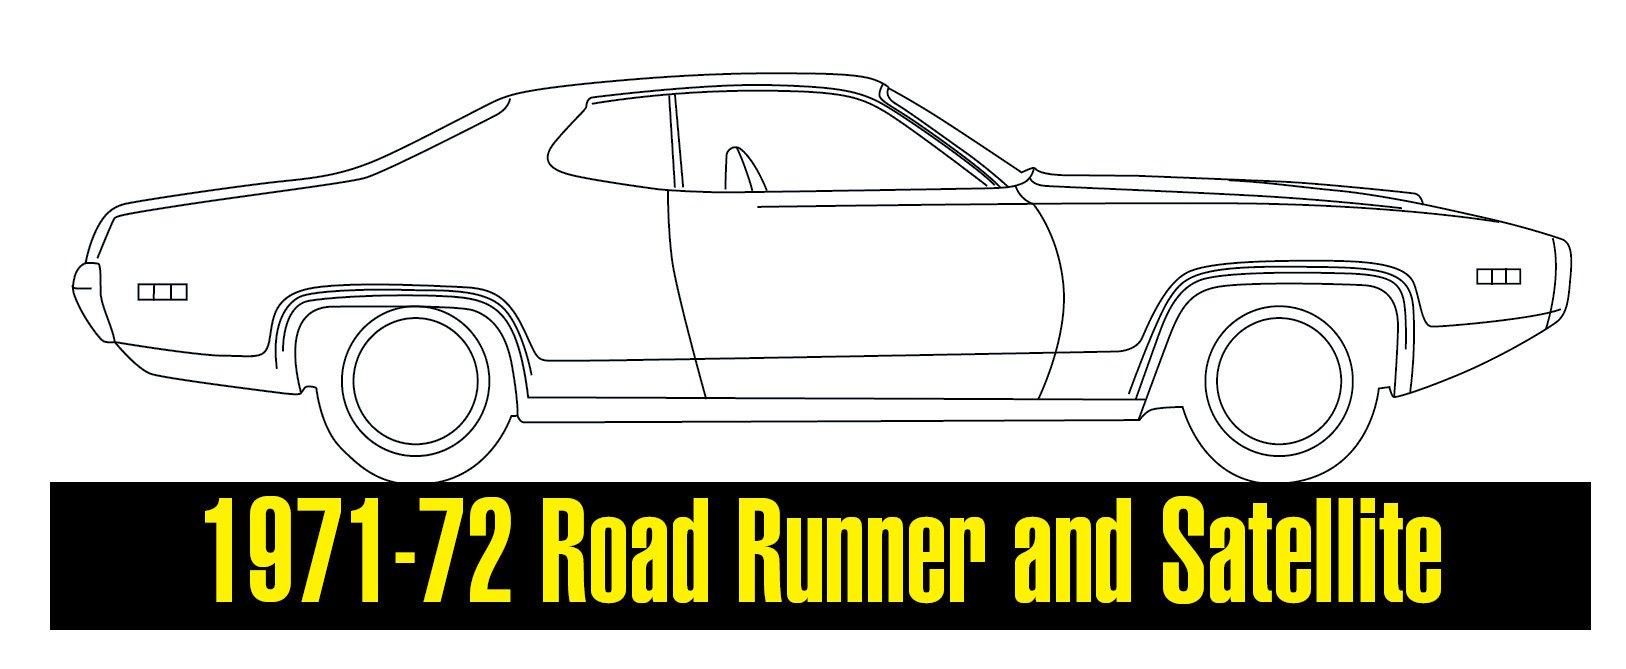 Classic_Plymouth_71_Satellite_RoadRunner